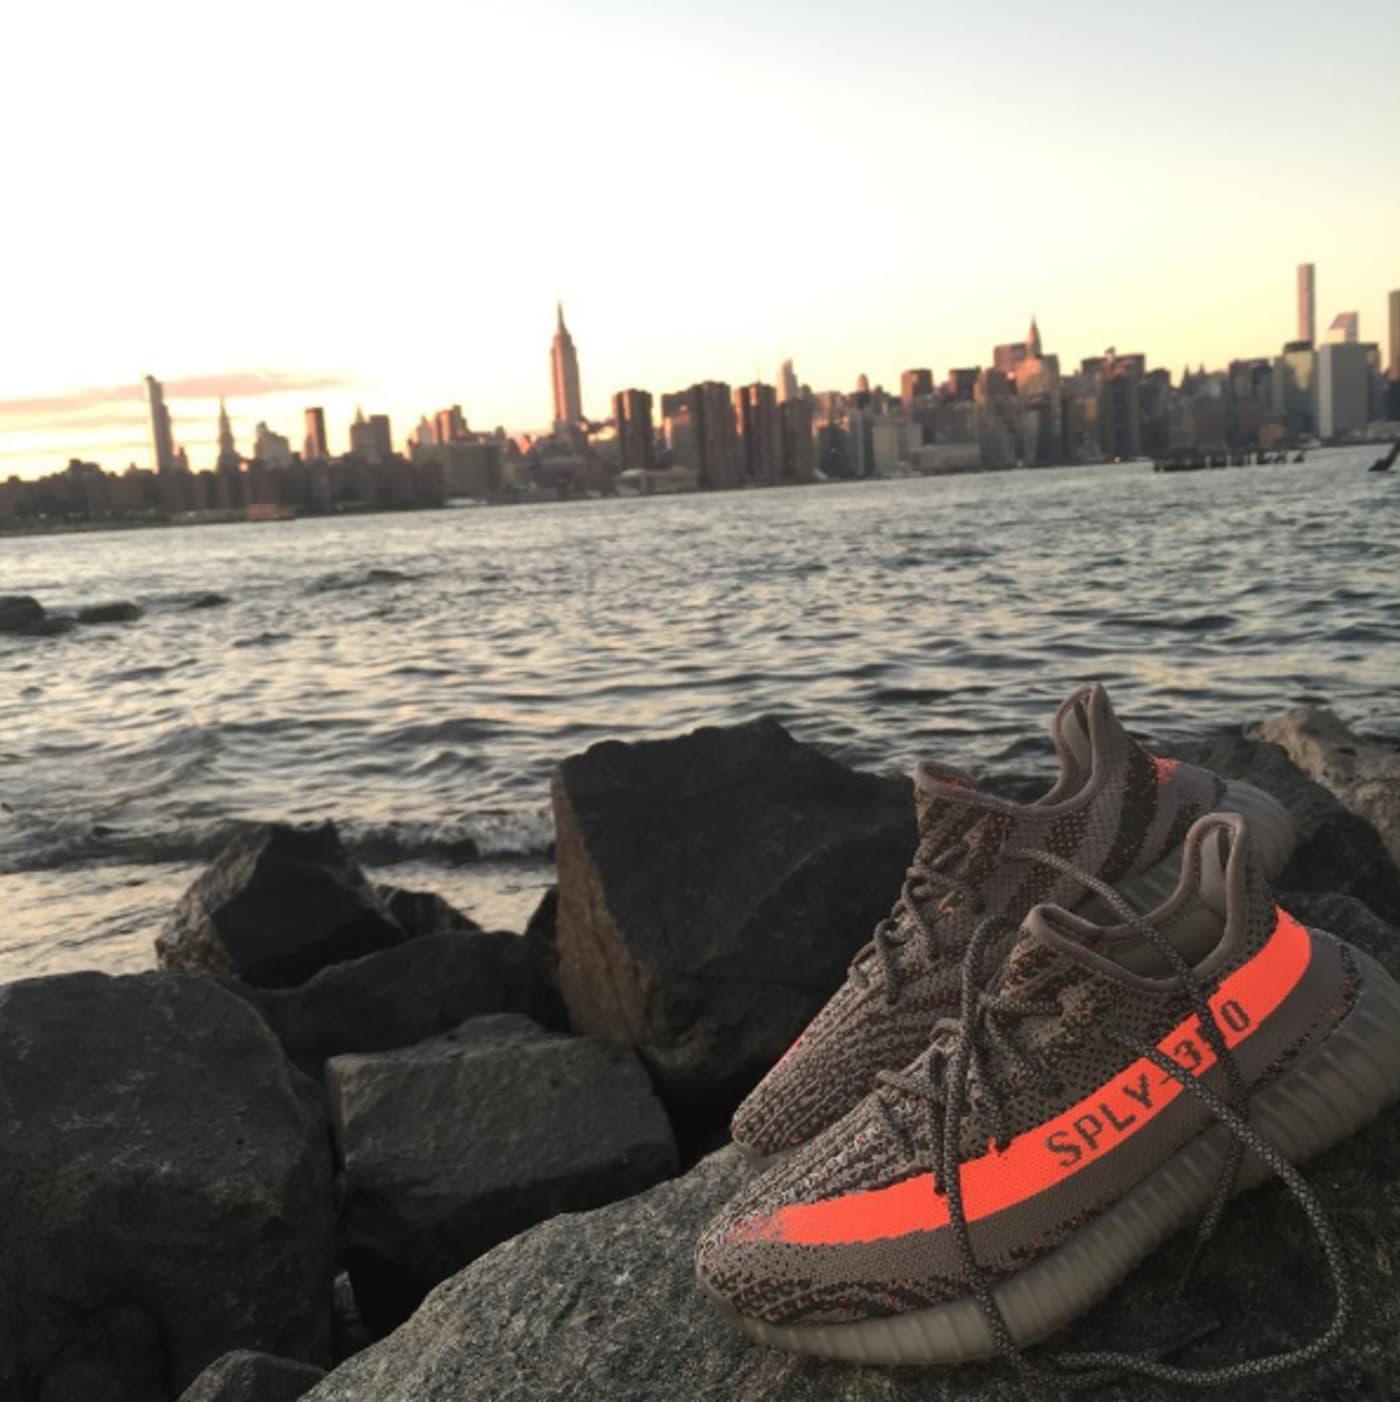 Adidas Yeezy Boost 350 v2 LSWOP